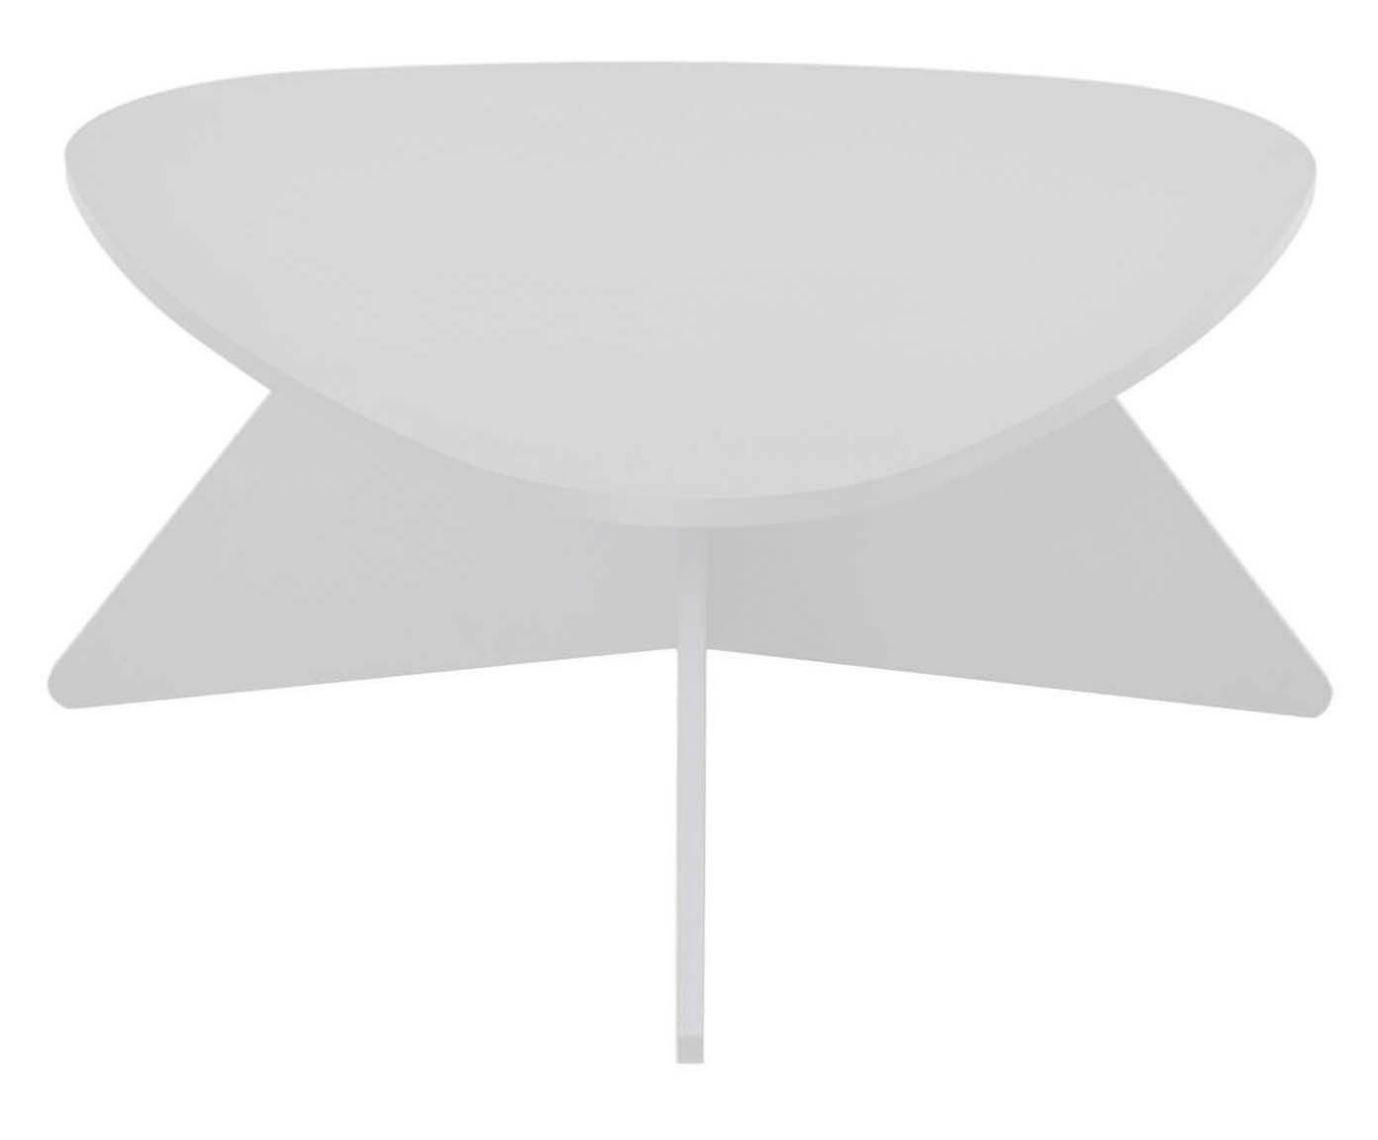 Mesa de Centro Munique Klar - 94x90cm | Westwing.com.br